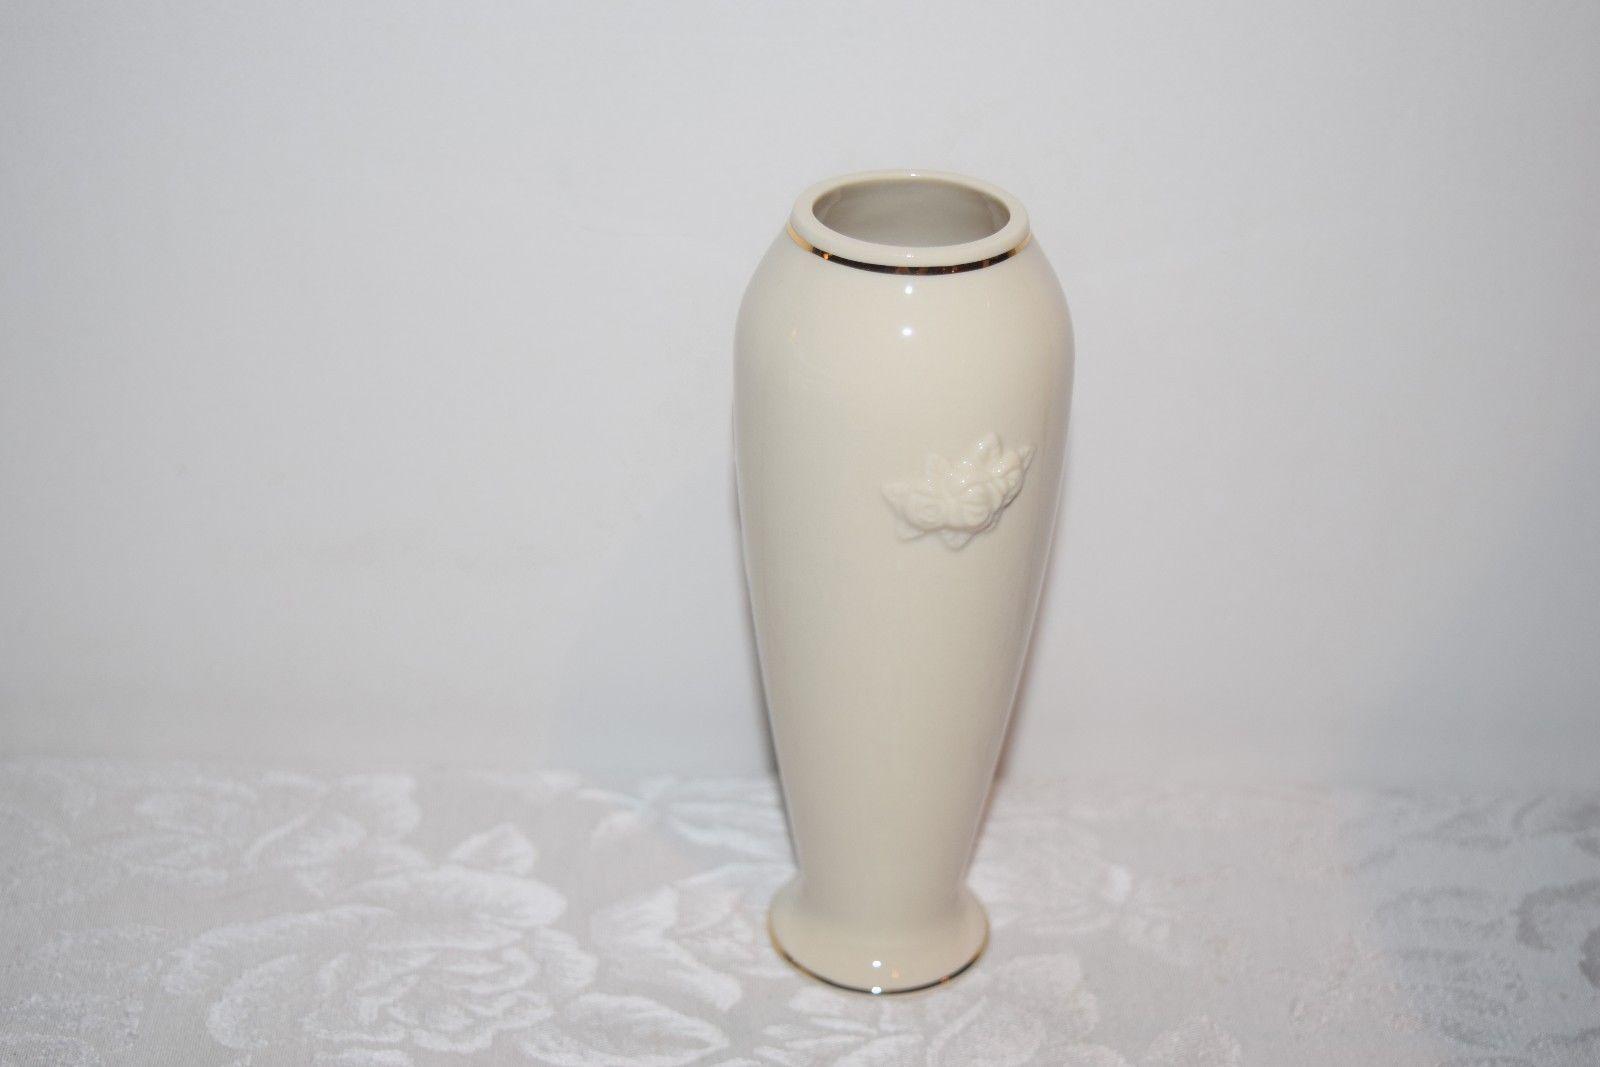 Royal winton grimwades vase 1930s 0 listings lenox collections rose bottom bud vase 086199 porcelain ivory new in box 2159 reviewsmspy